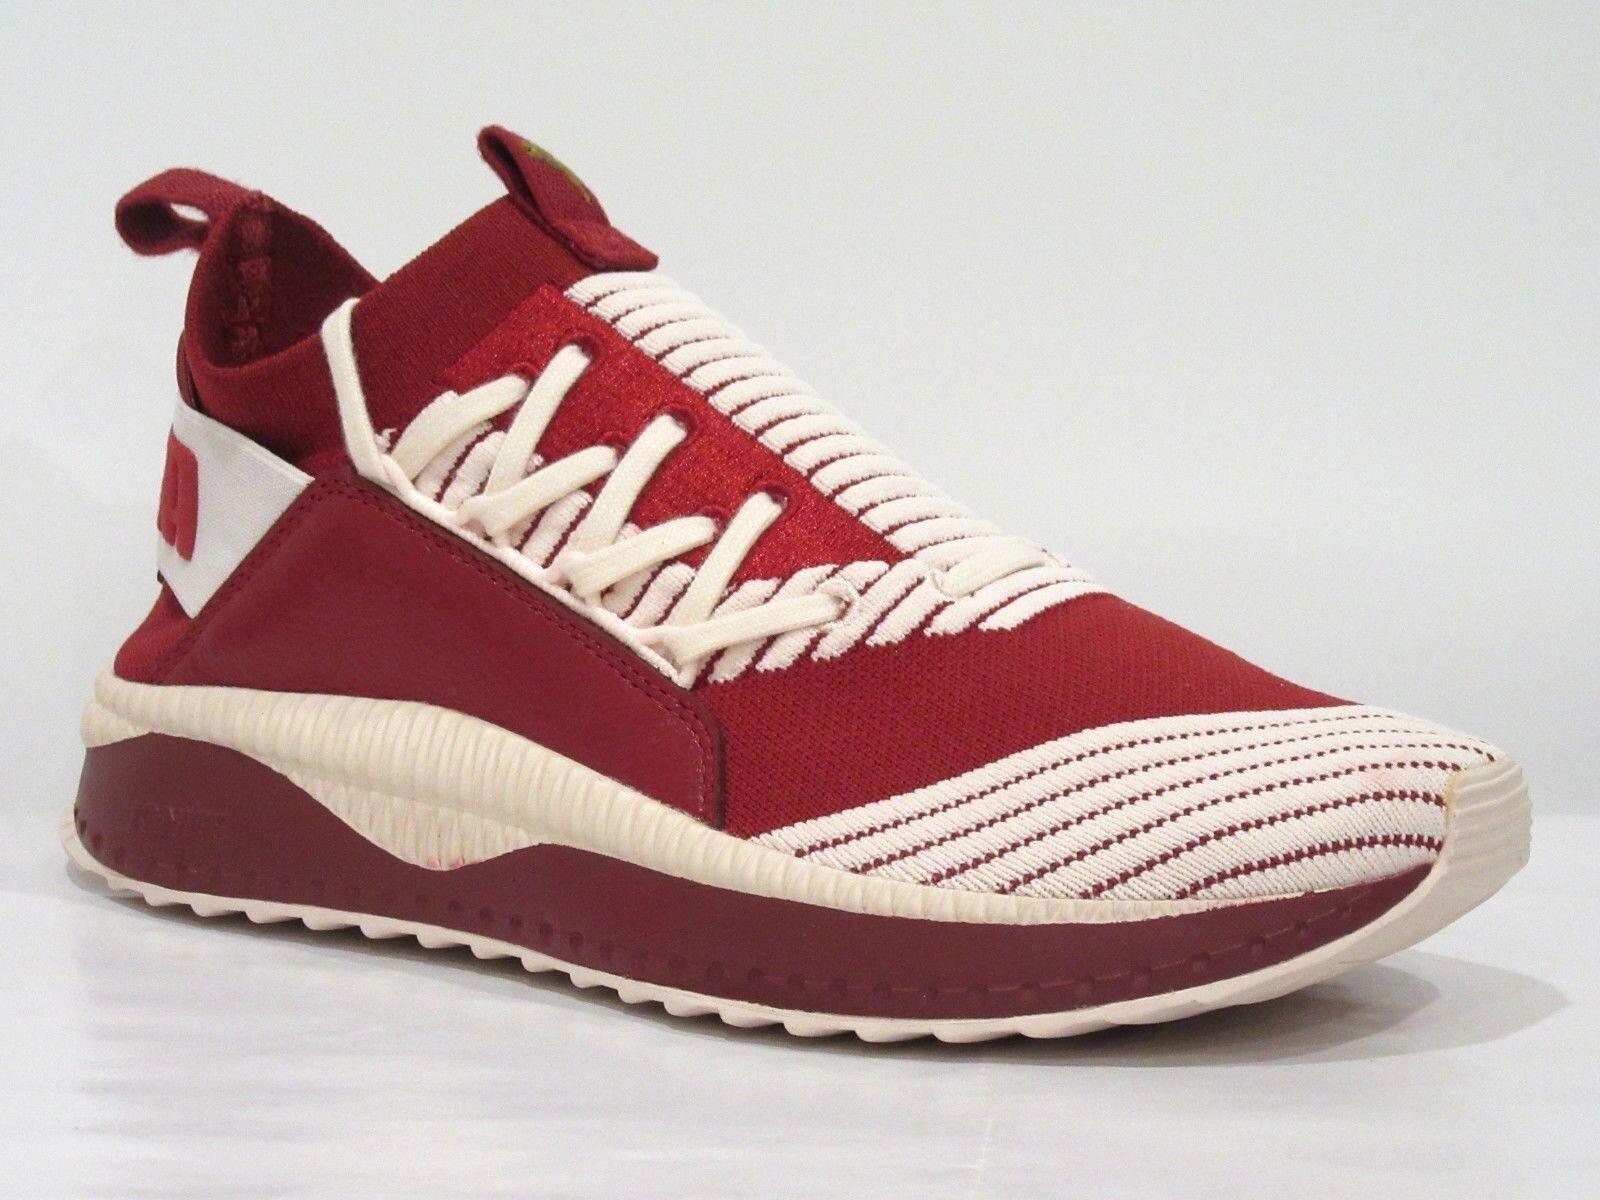 PUMA Women's Tsugi Jun Red Dahlia Pearl Ankle-High Walking shoes